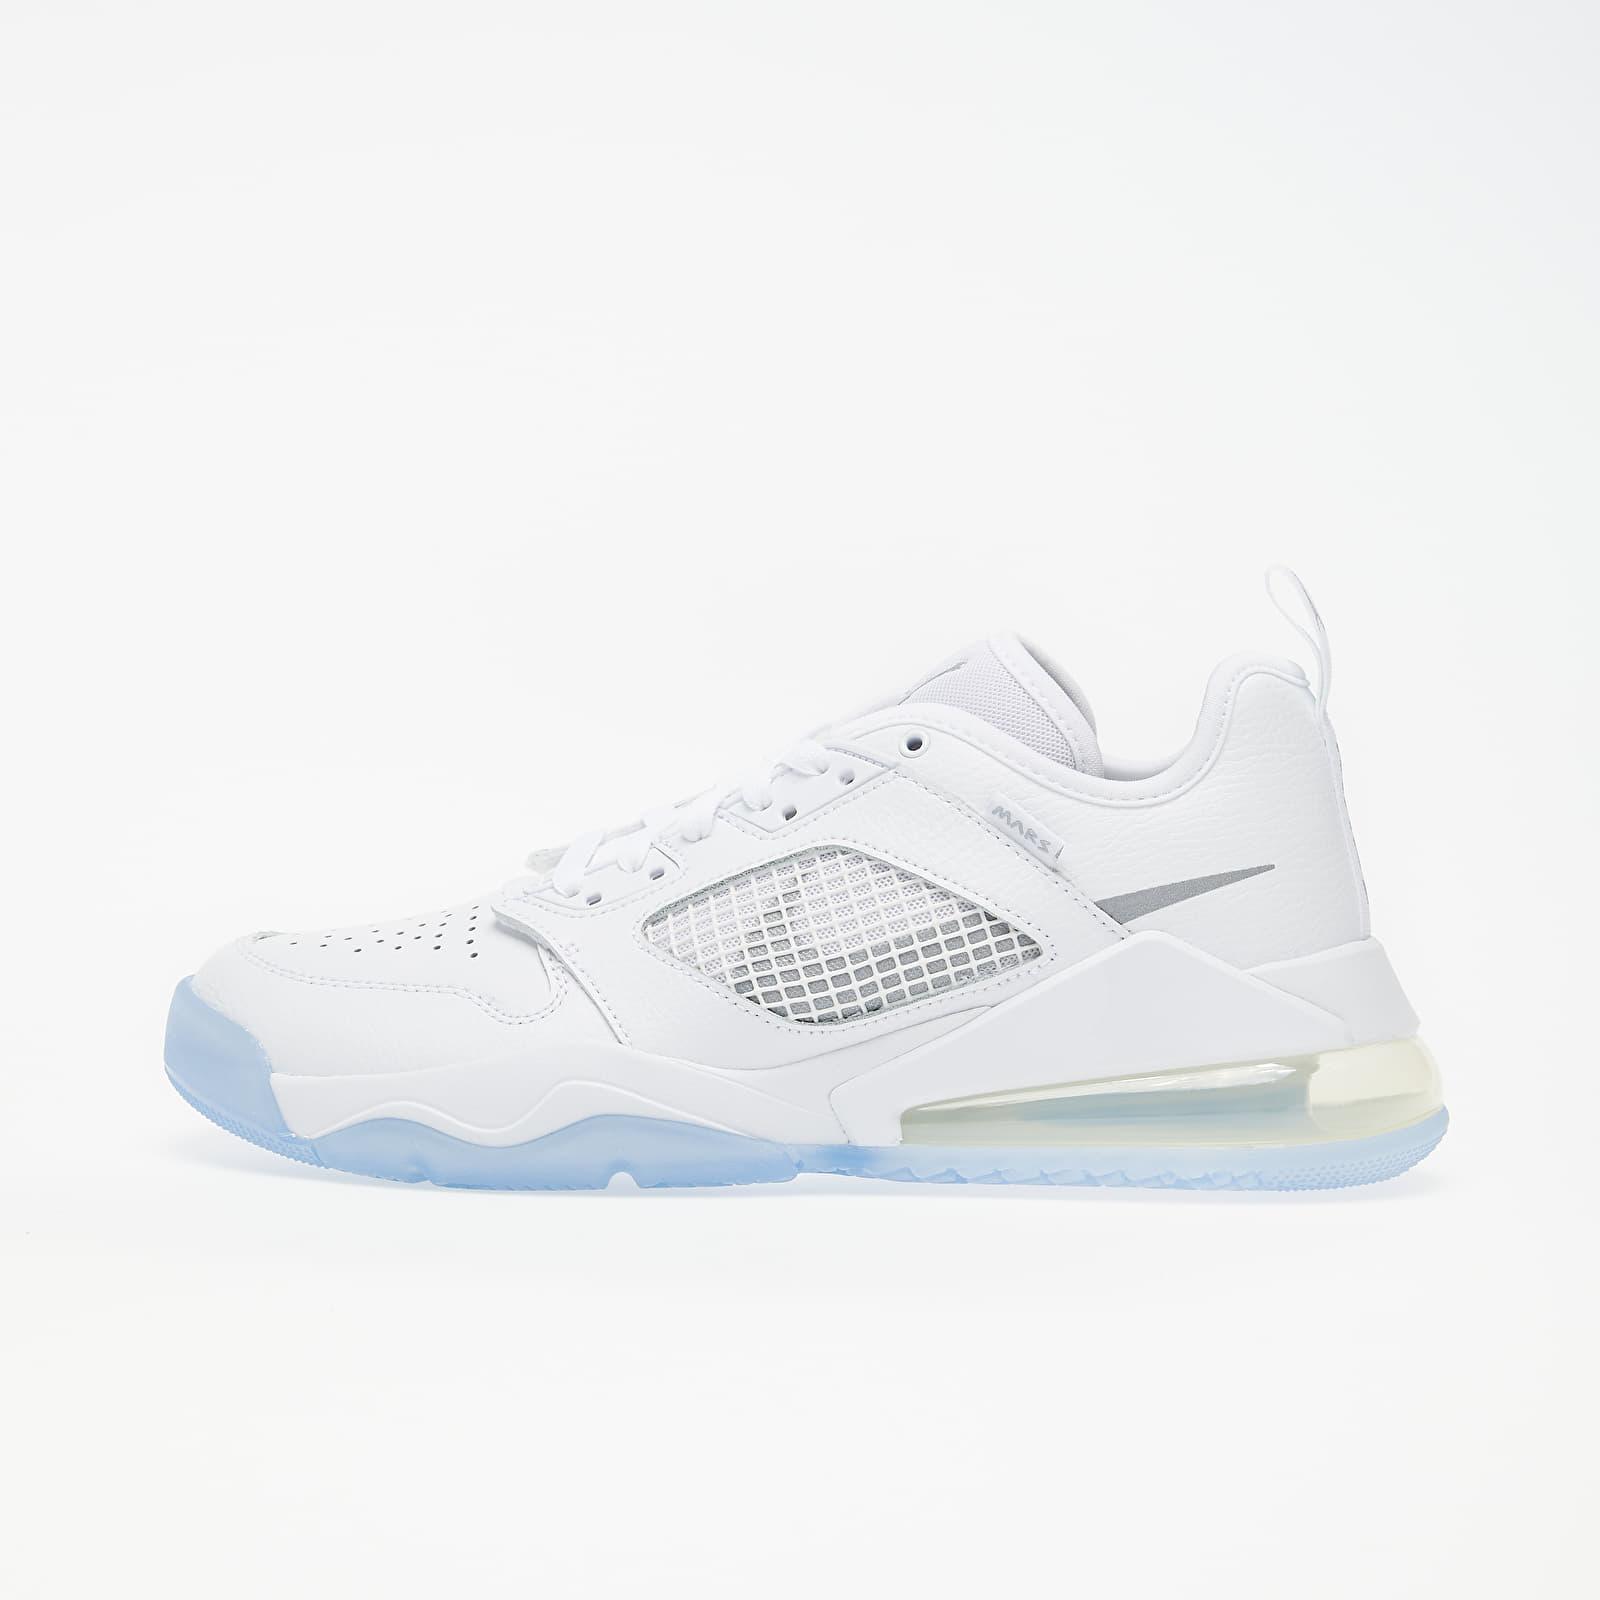 Pánske tenisky a topánky Jordan Mars 270 Low White/ Metallic Silver-White